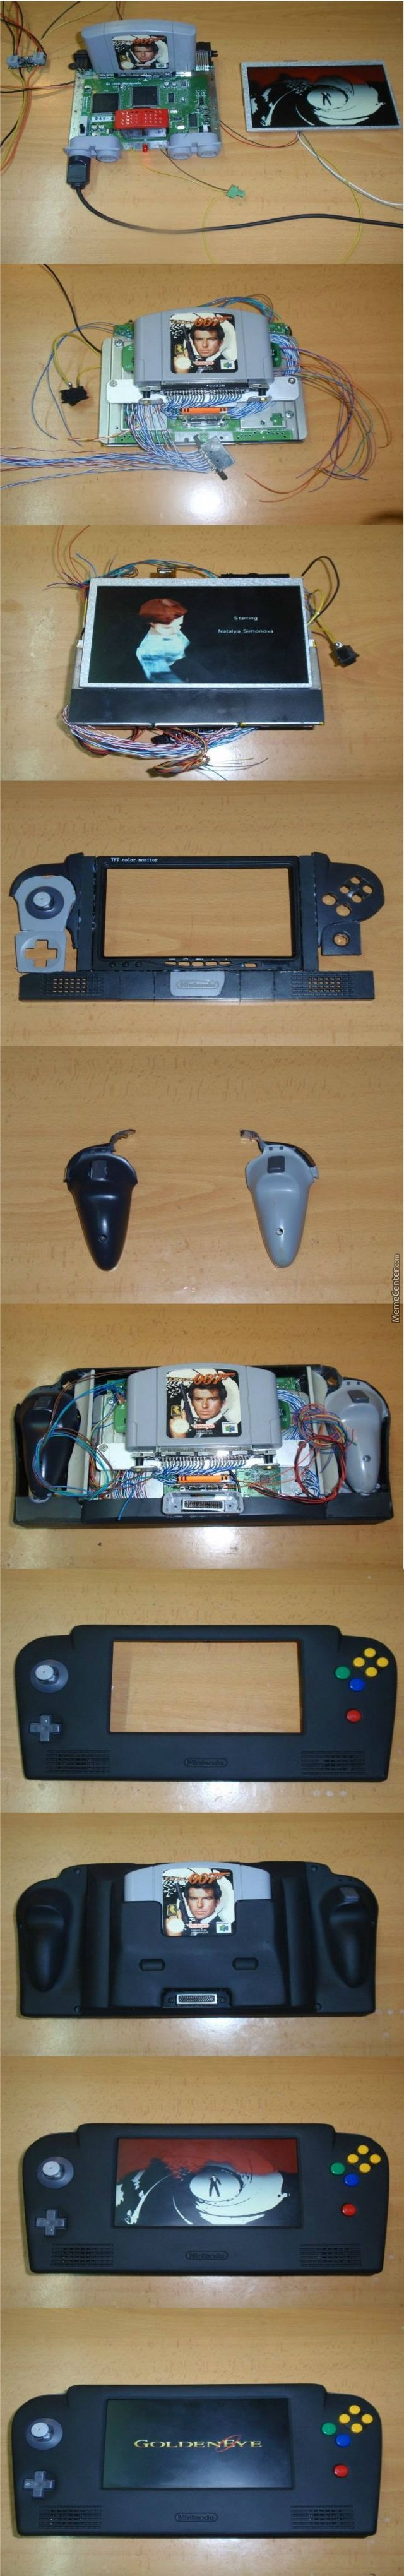 N64 Portable Version? Want! –  – #DiyGamer